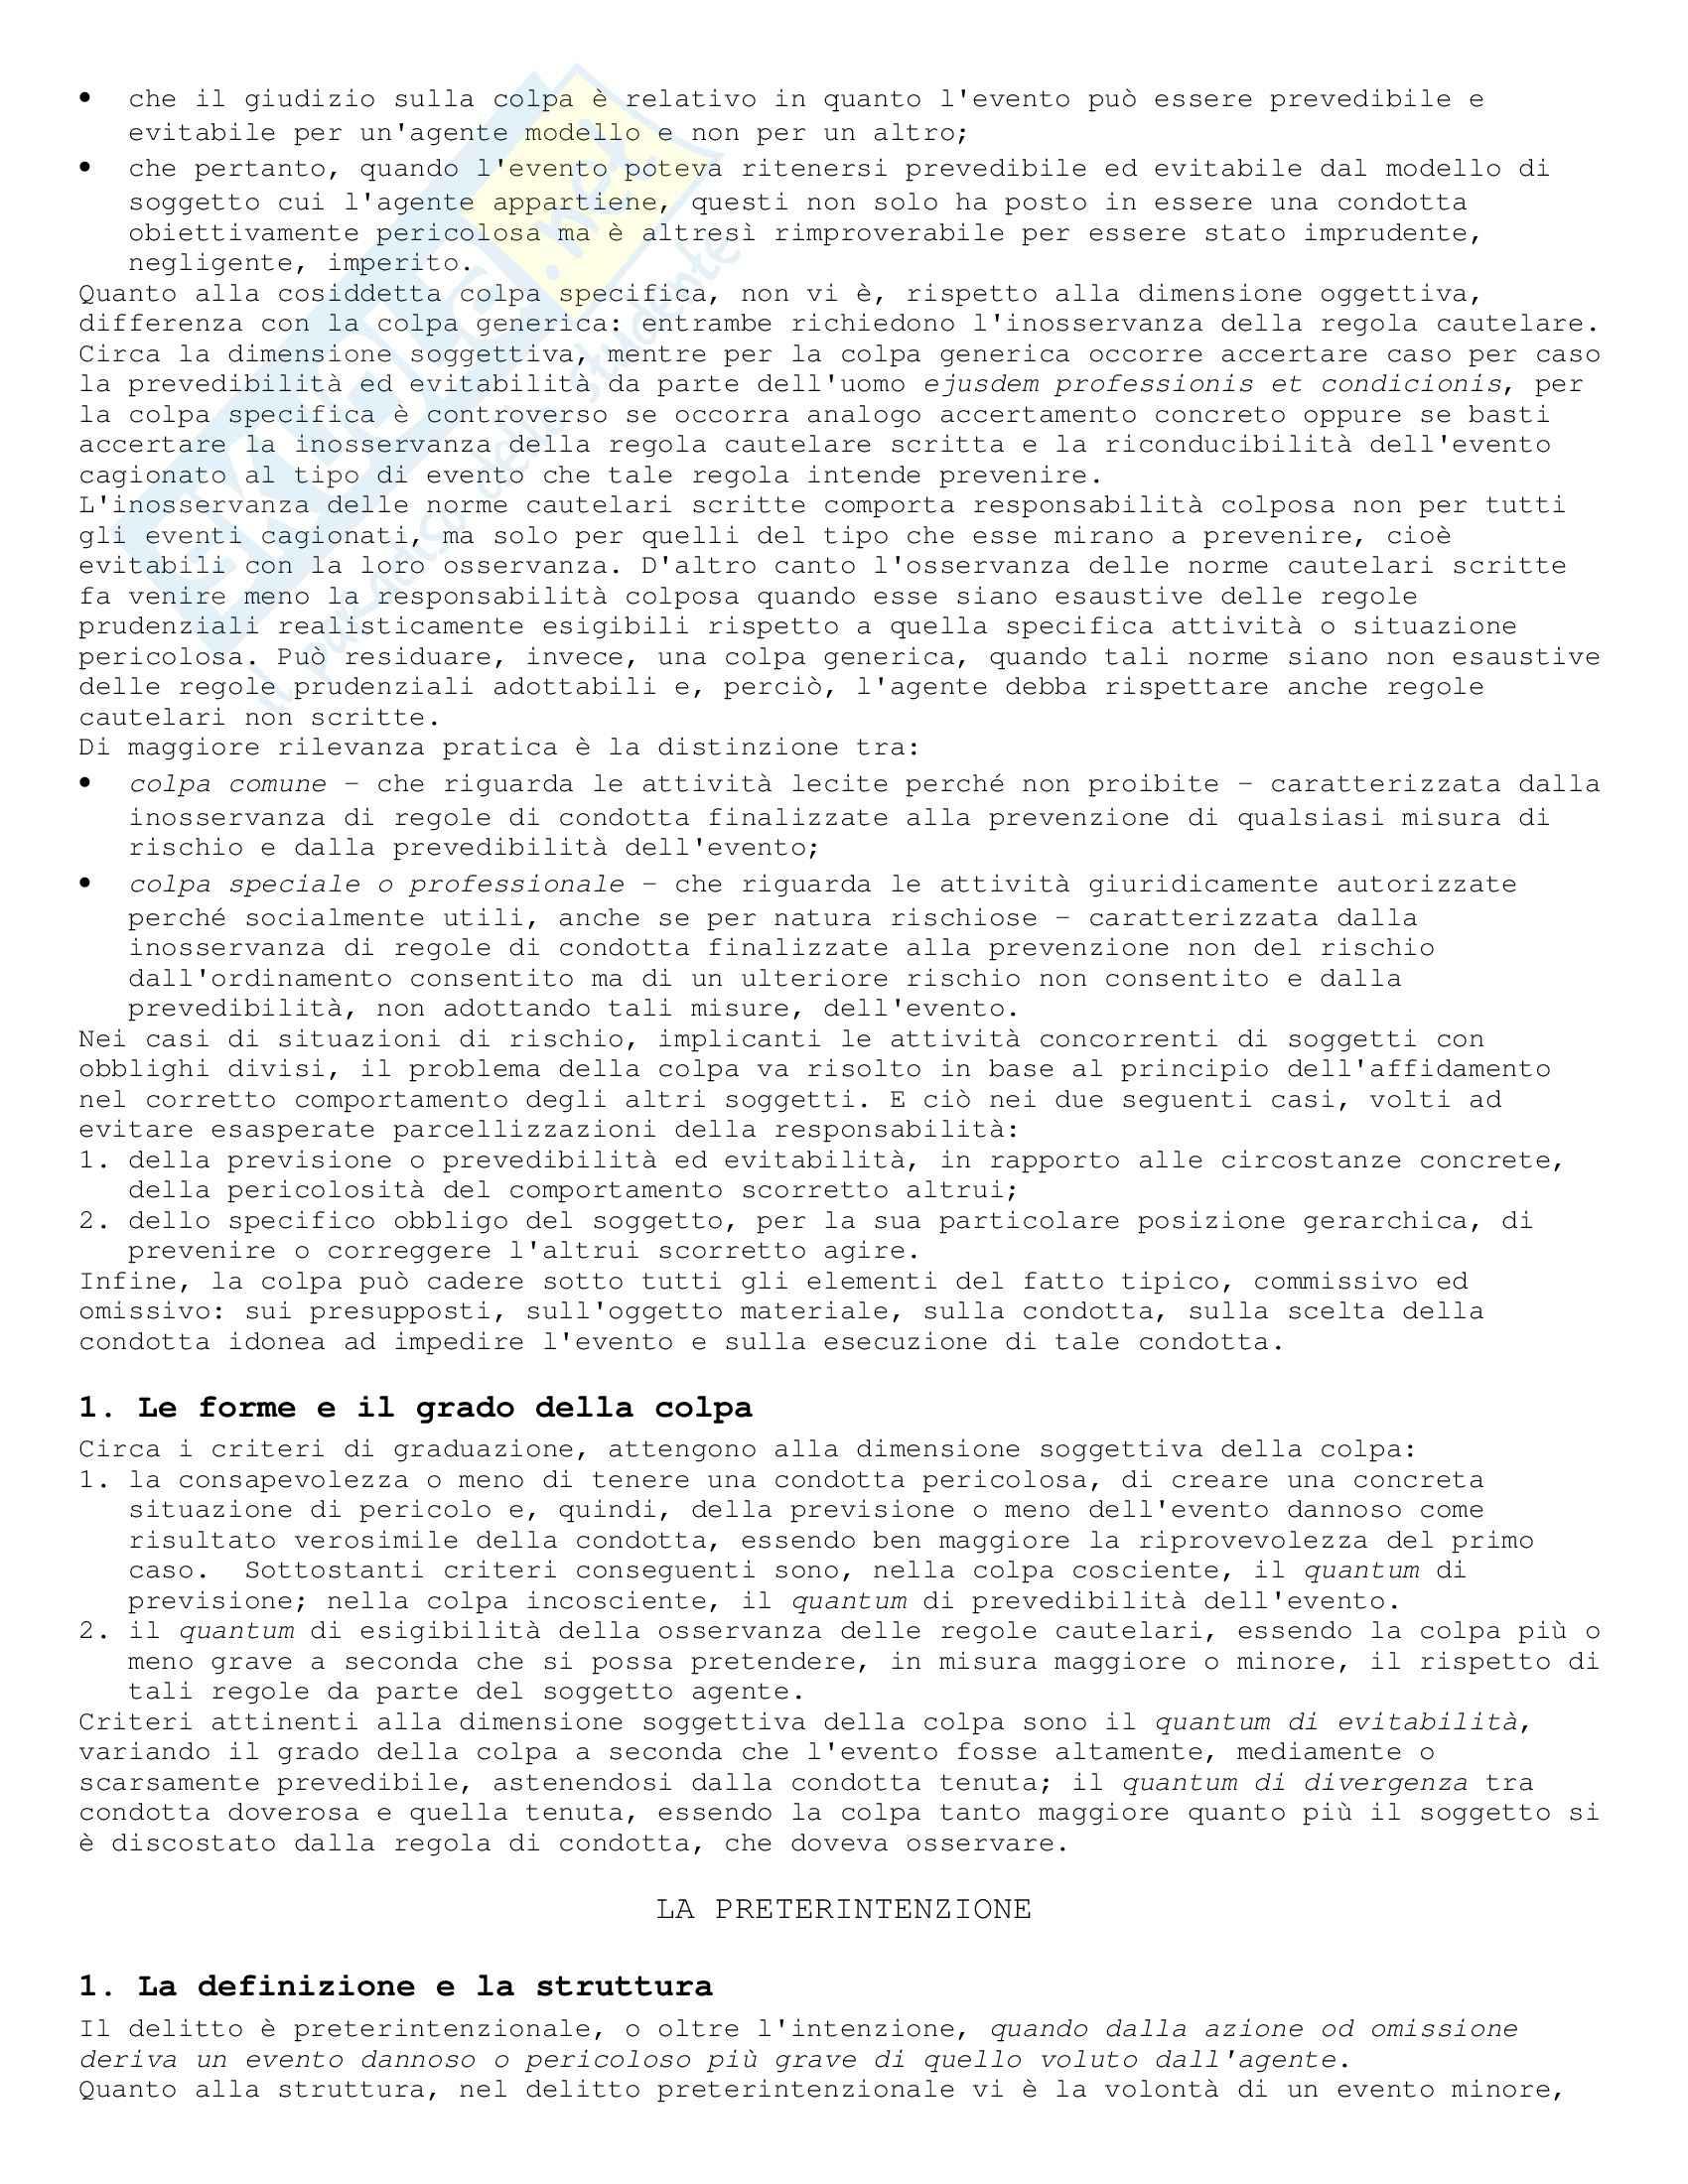 Diritto penale - Riassunto esame Pag. 36